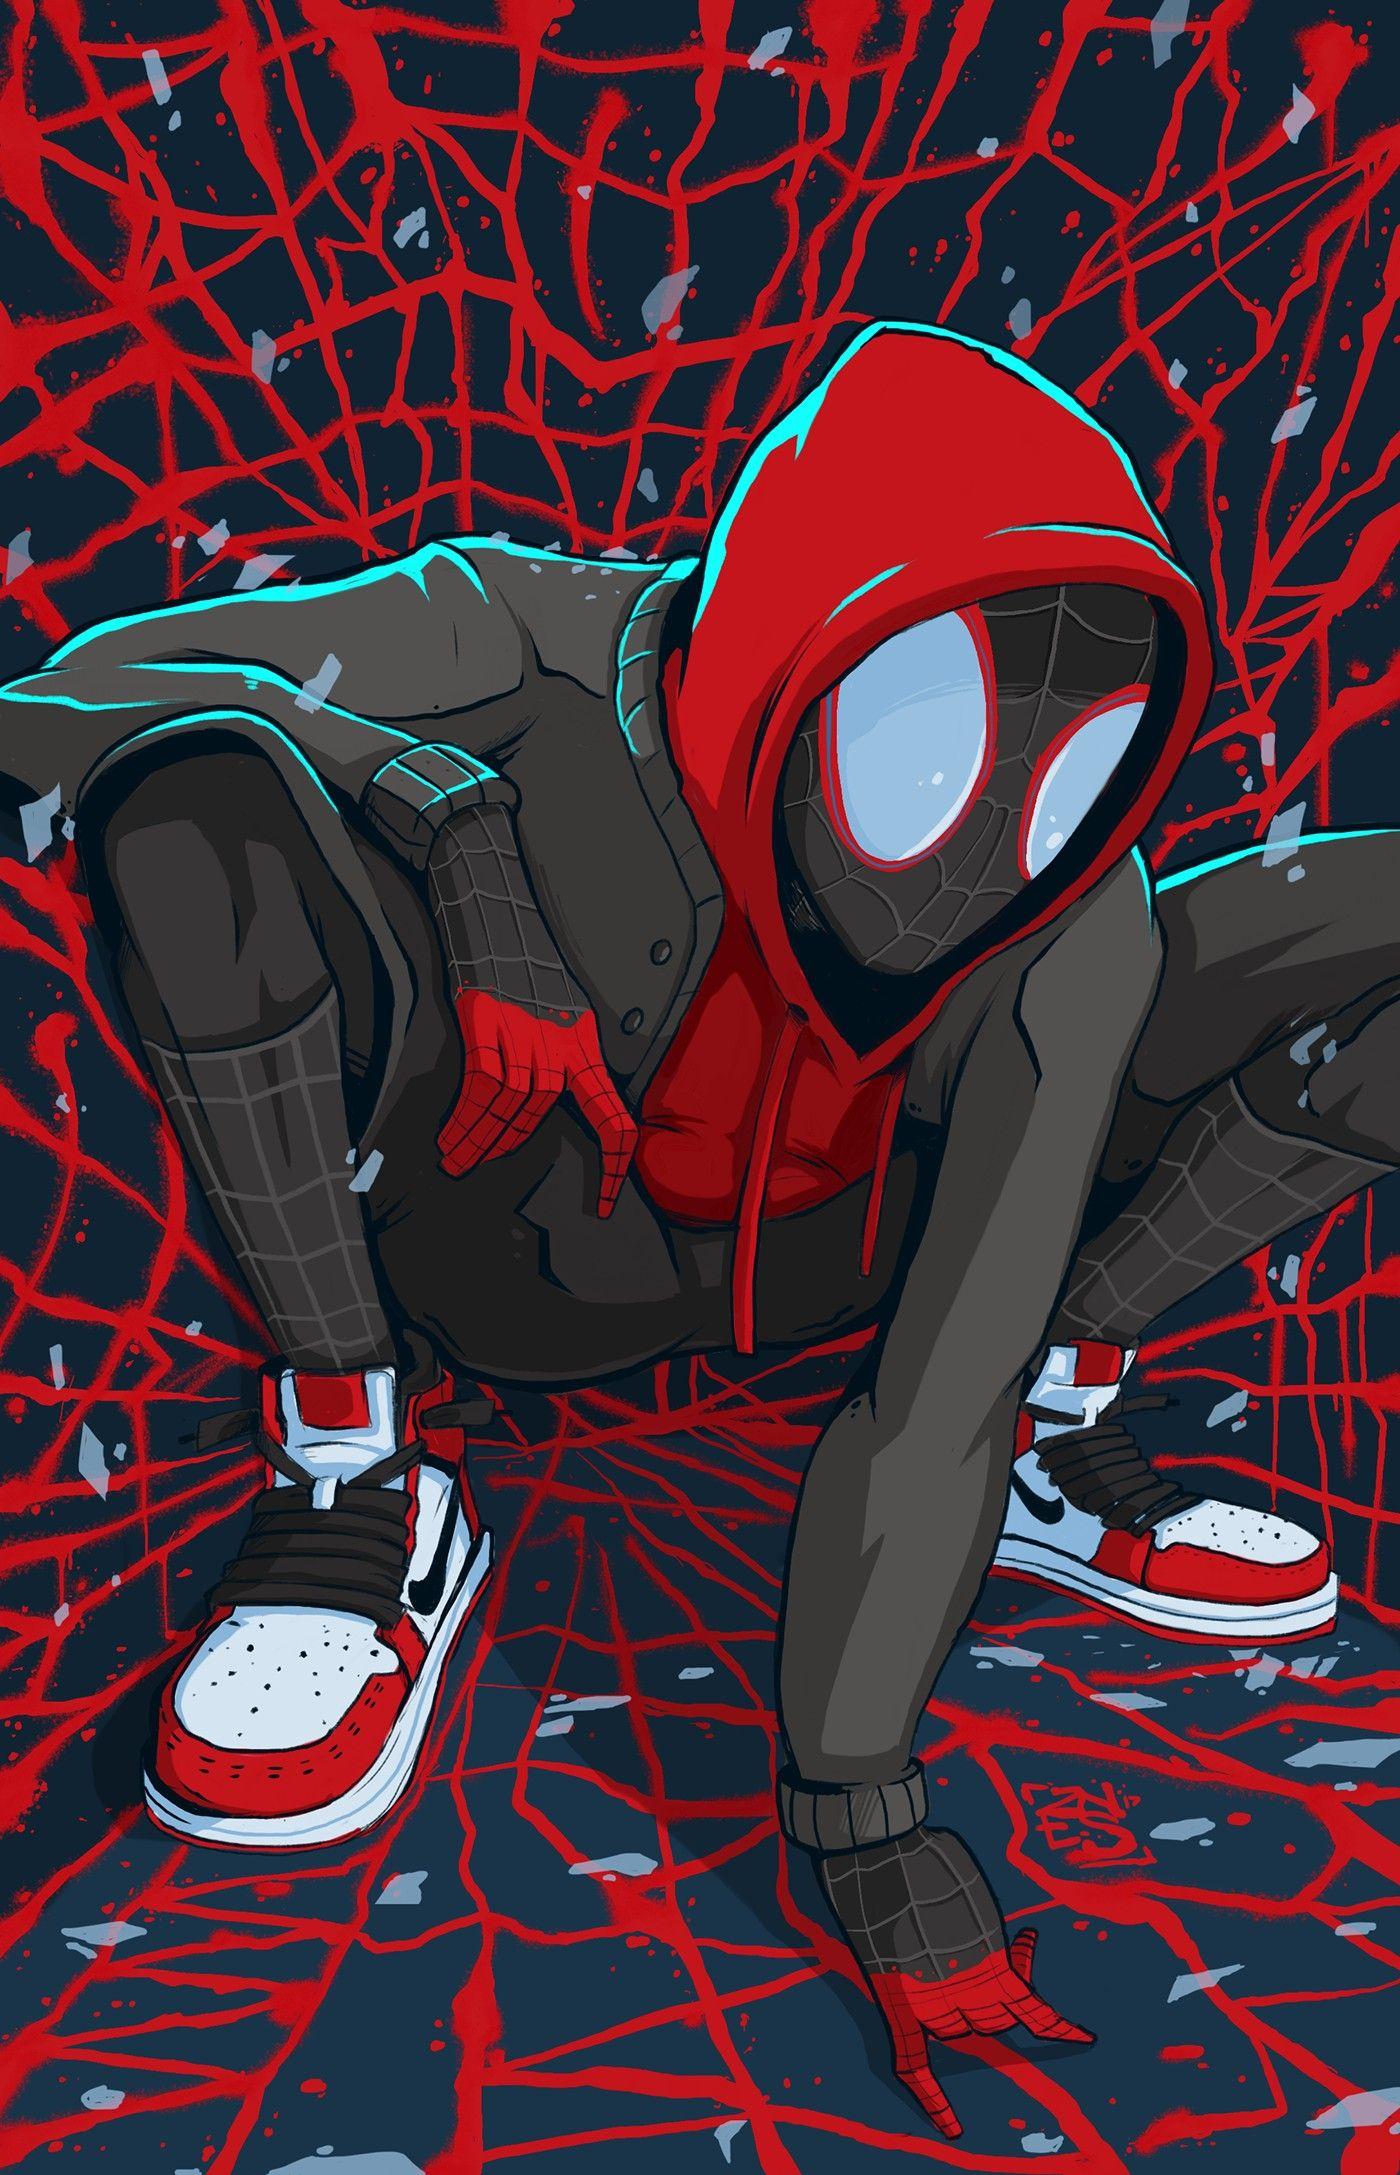 Miles Morales, Ultimate SpiderMan Hombre araña comic